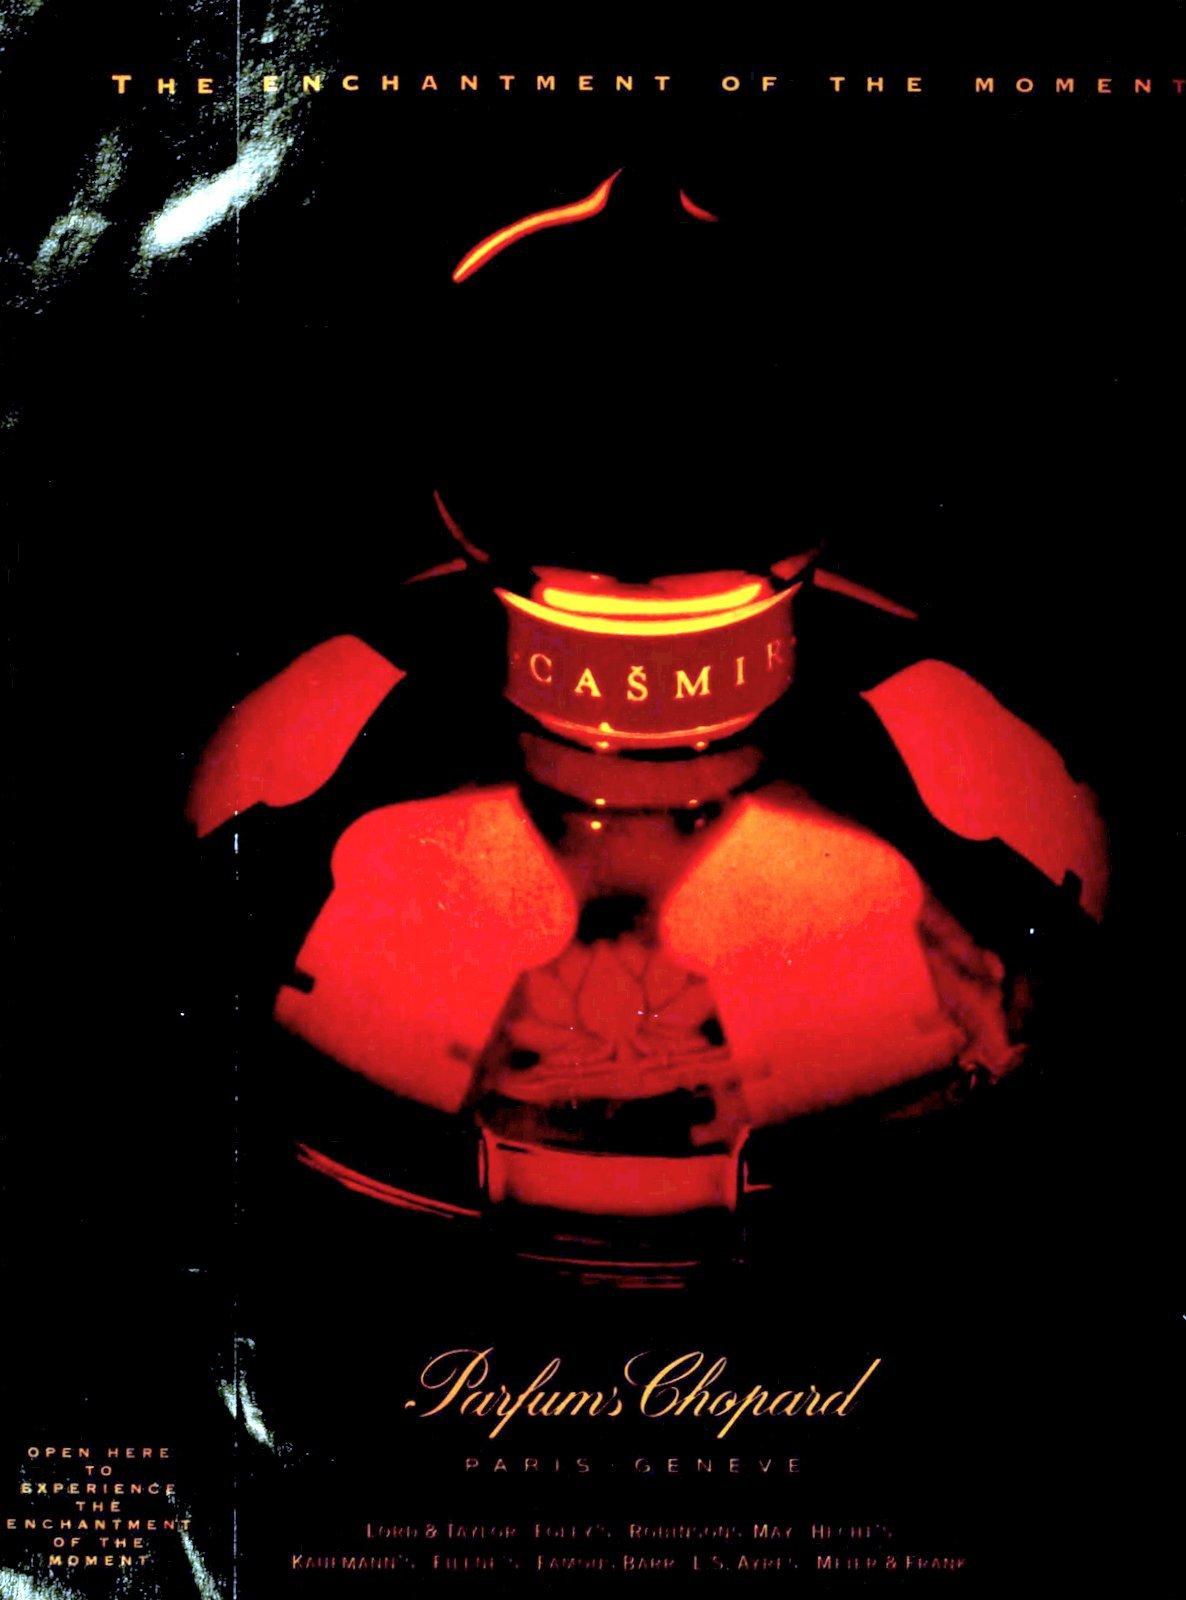 Casmir perfume from Parfums Chopard (1994) at ClickAmericana.com